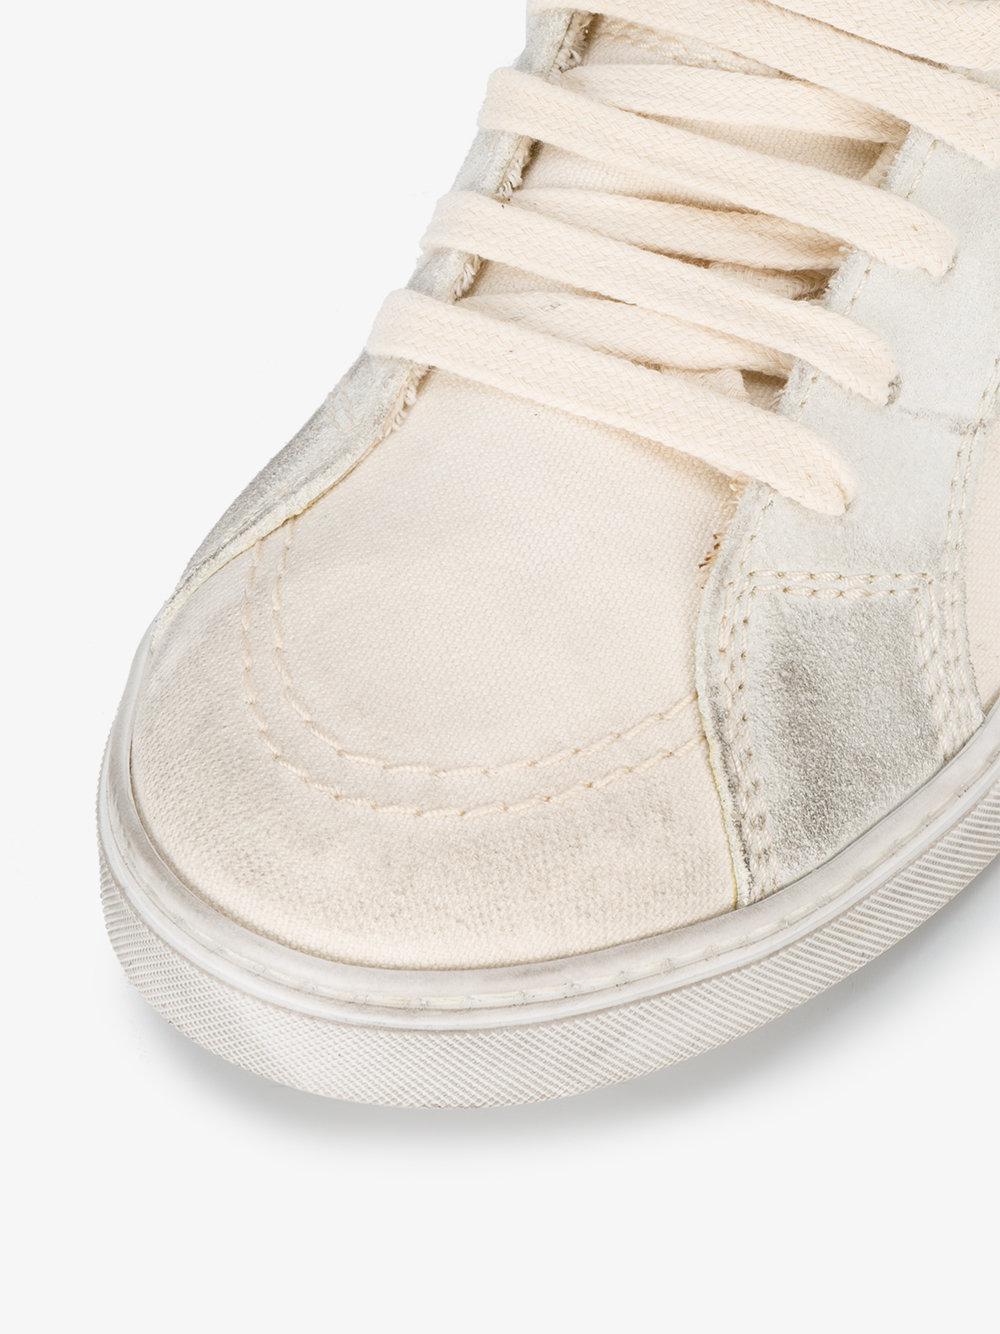 White Joe canvas hi top sneakers Saint Laurent 4h84Hd9DY